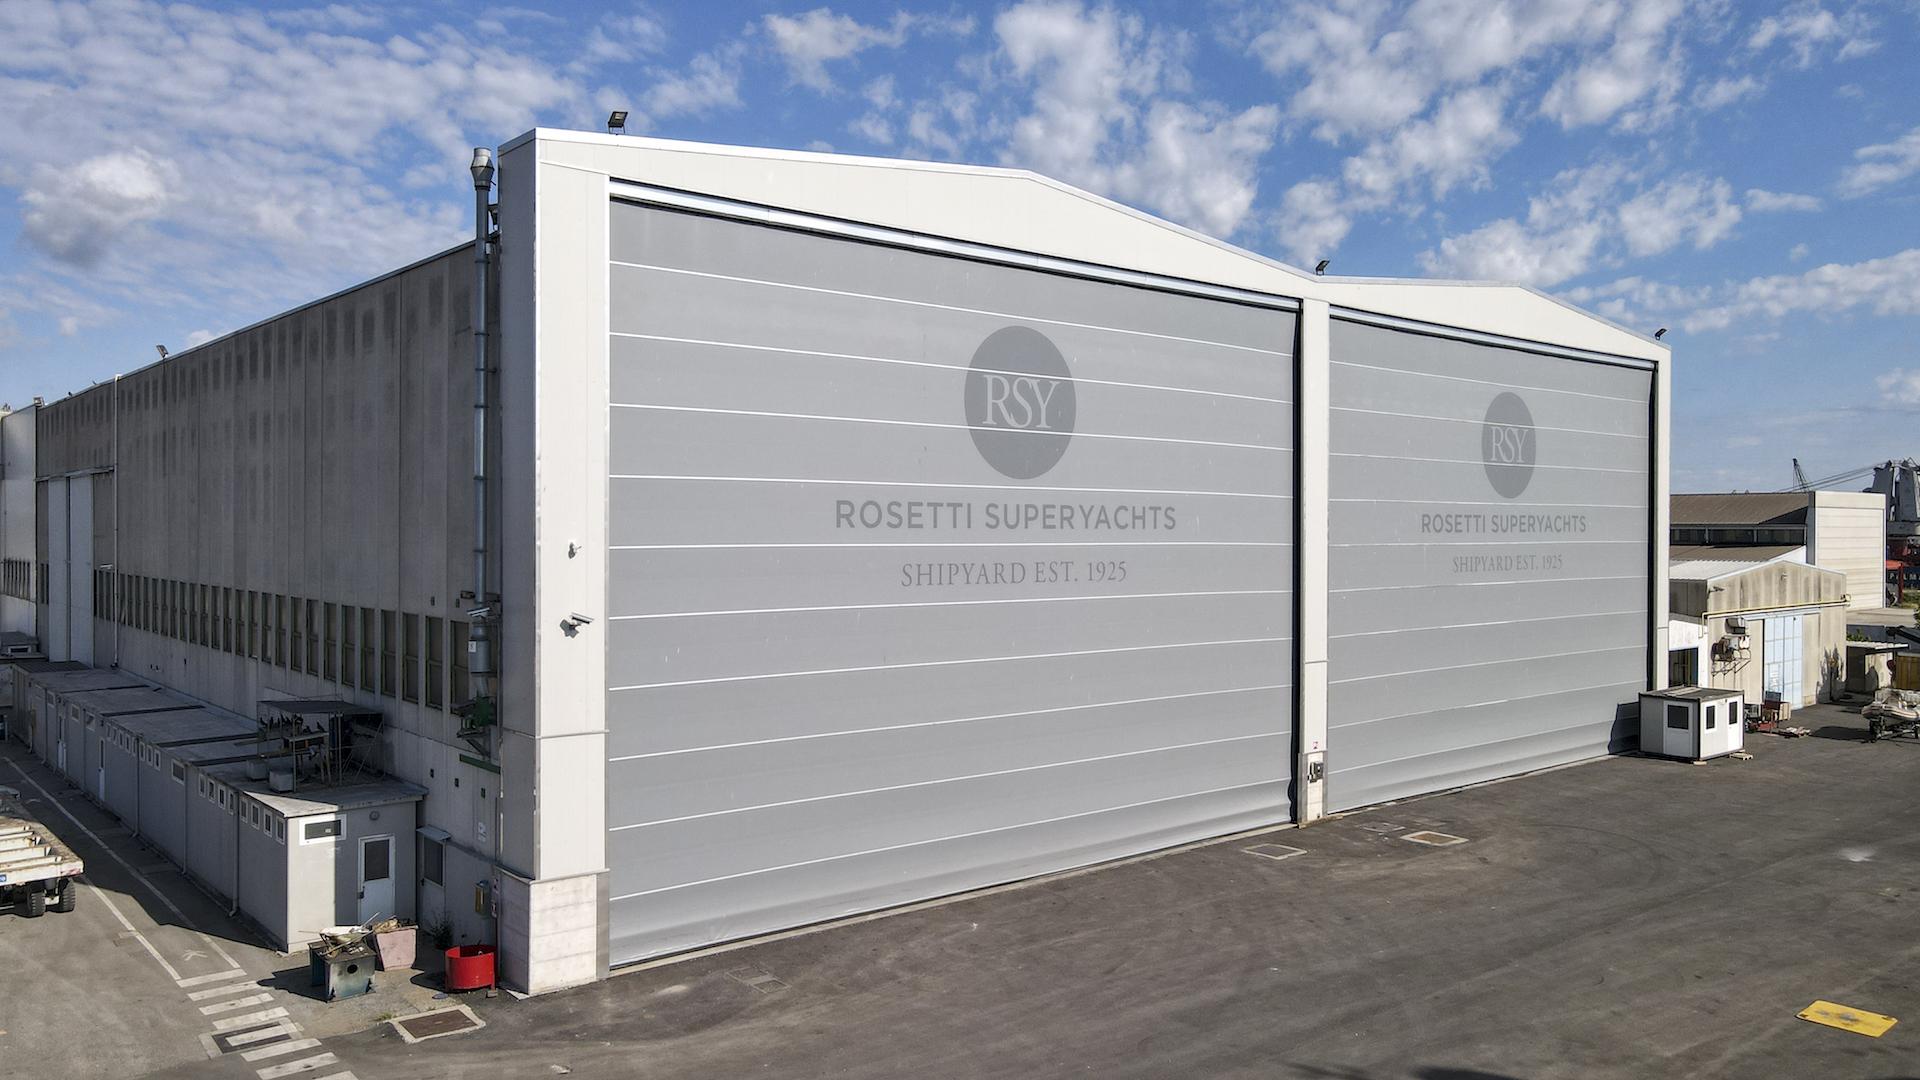 Rosetti superyachts warehouse exterior